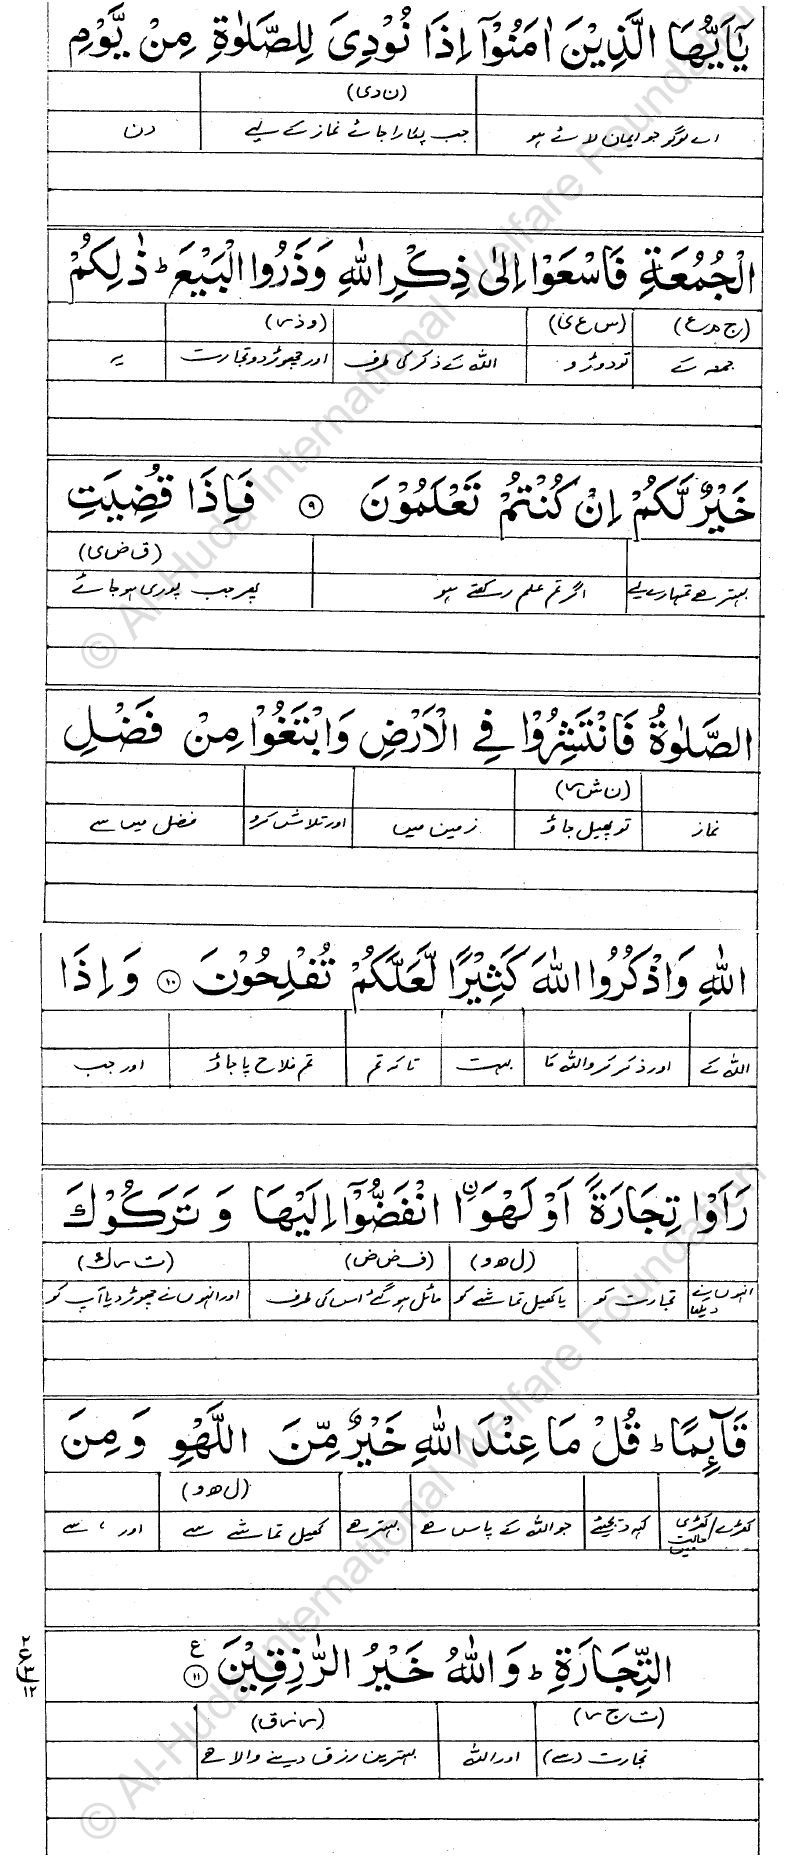 Al Jumu Ah Ayat 9 11 : Lesson, Al-Jumu'ah, الجمعۃ, Registered, Classes, Preparatory, Platform